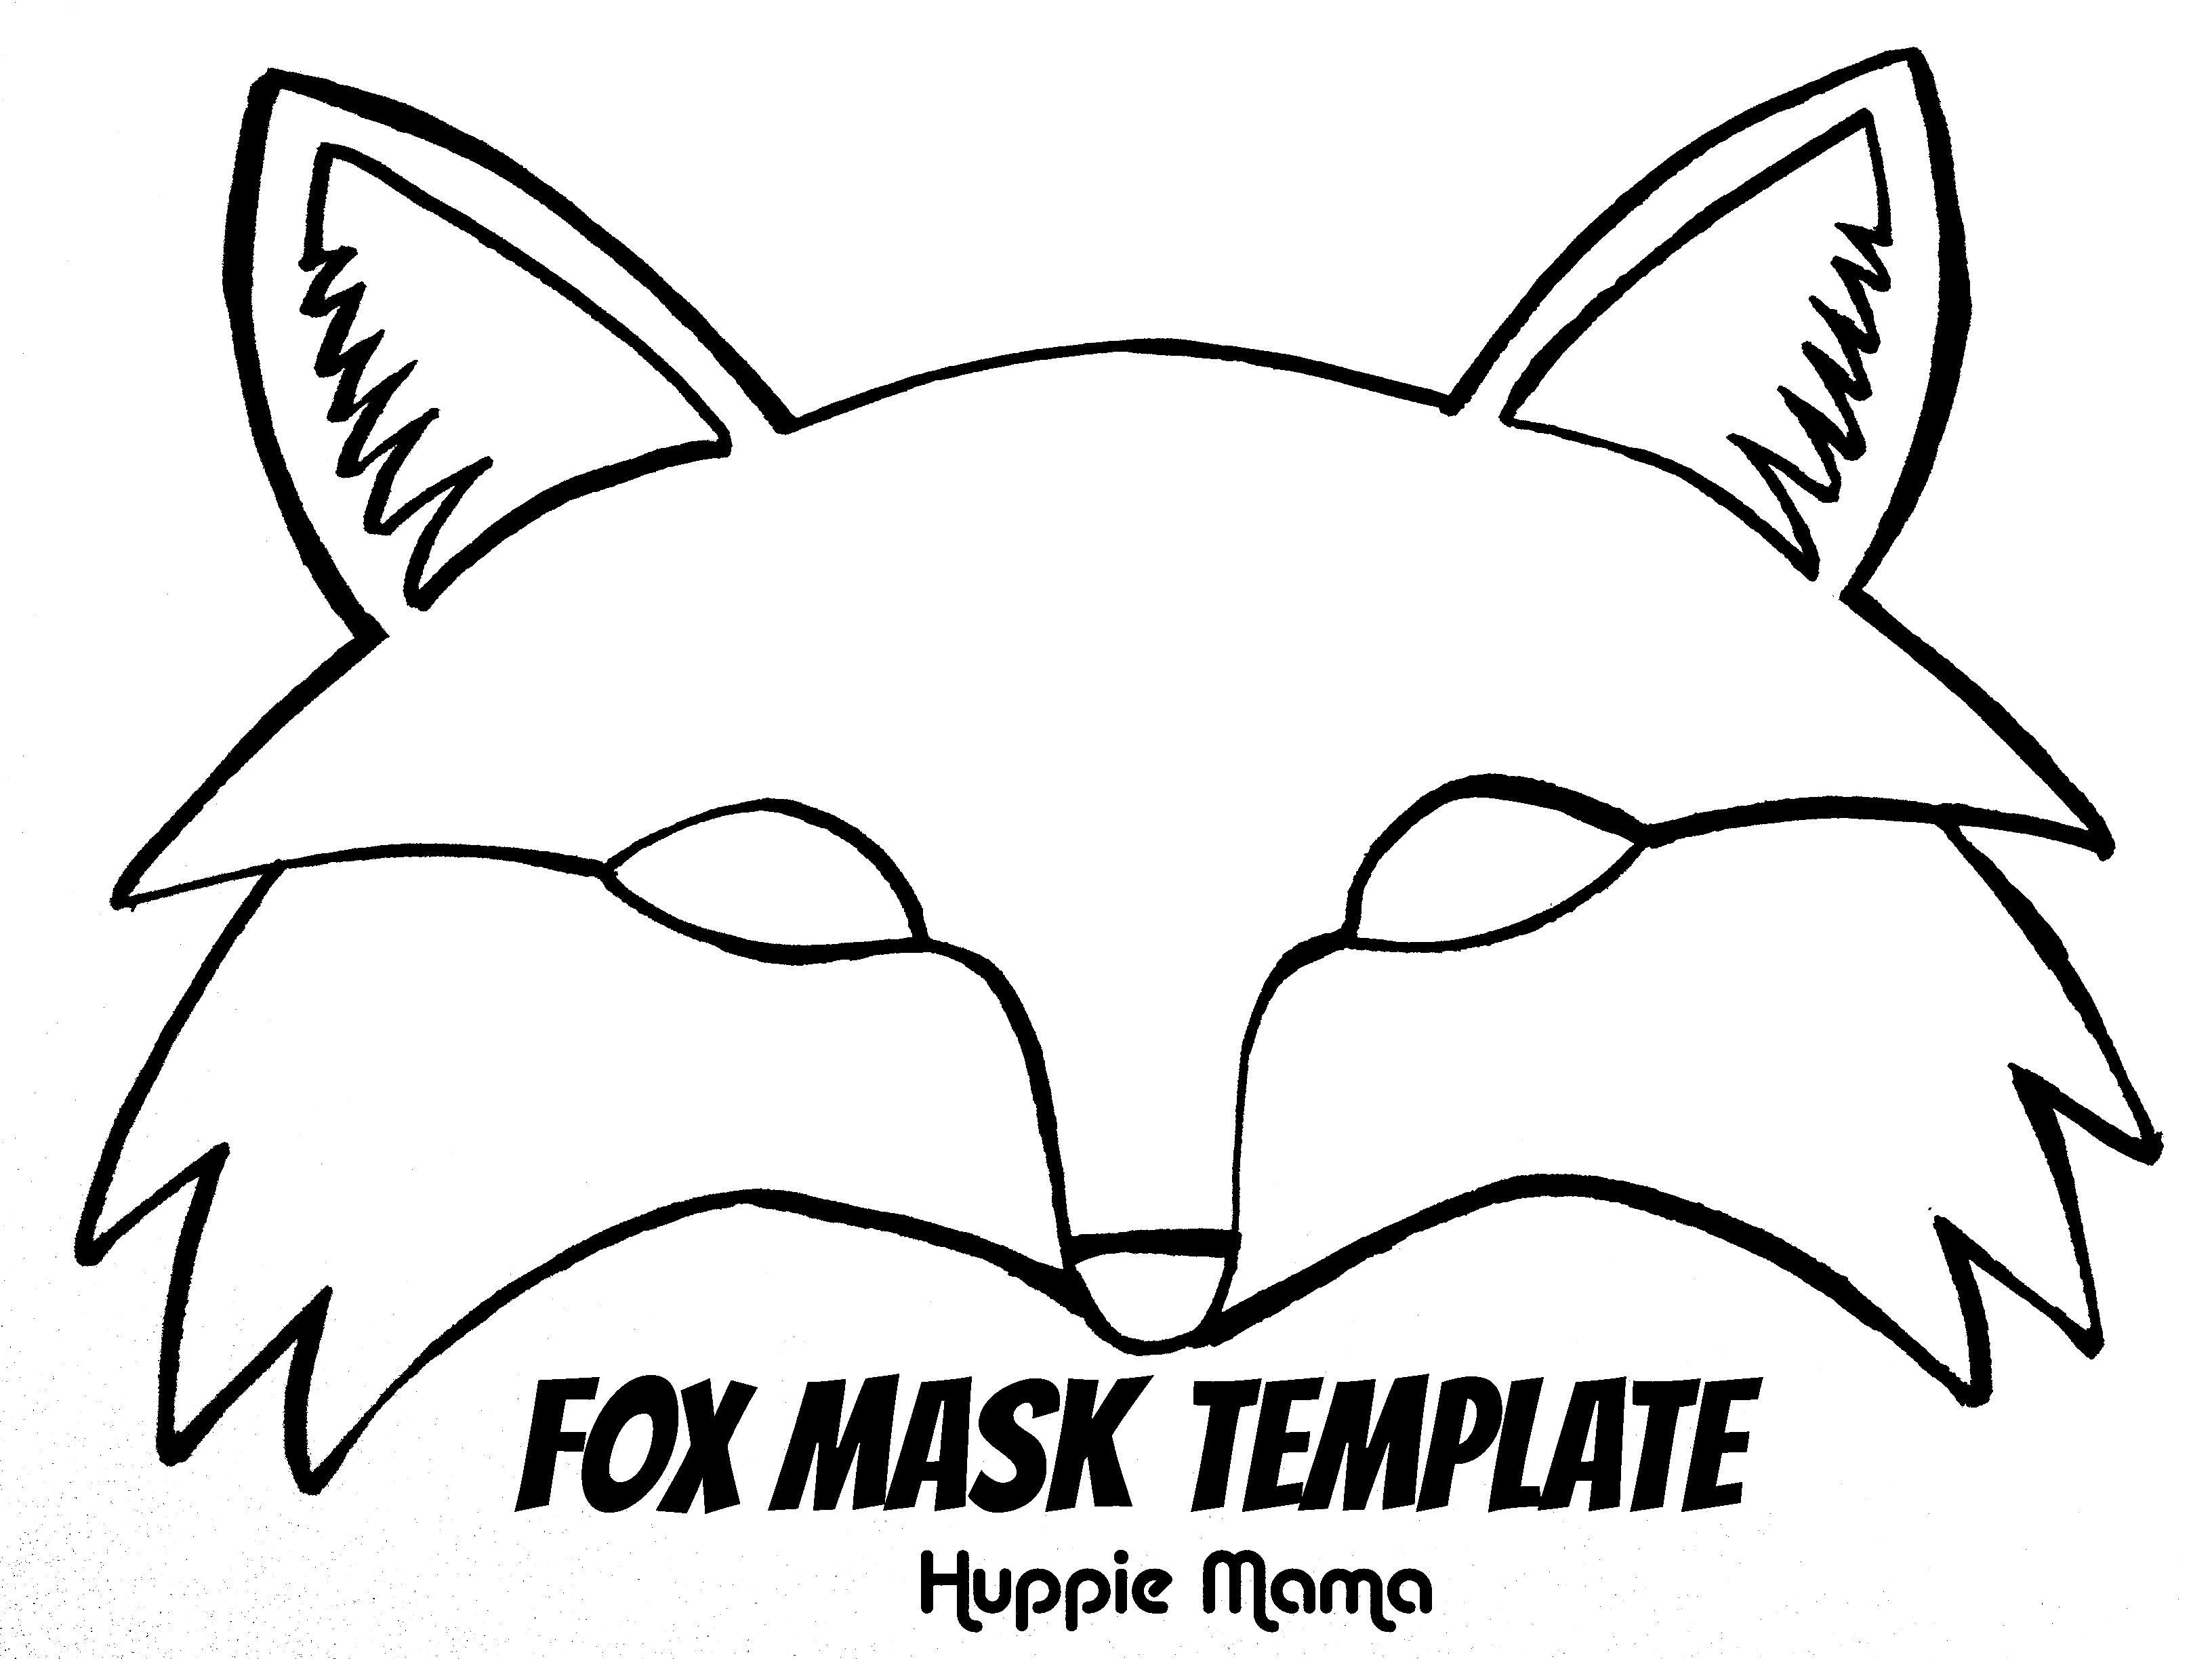 Fox Mask Template | Wood Work | Fox Mask, Fantastic Mr Fox, Mr Fox - Free Printable Fox Mask Template